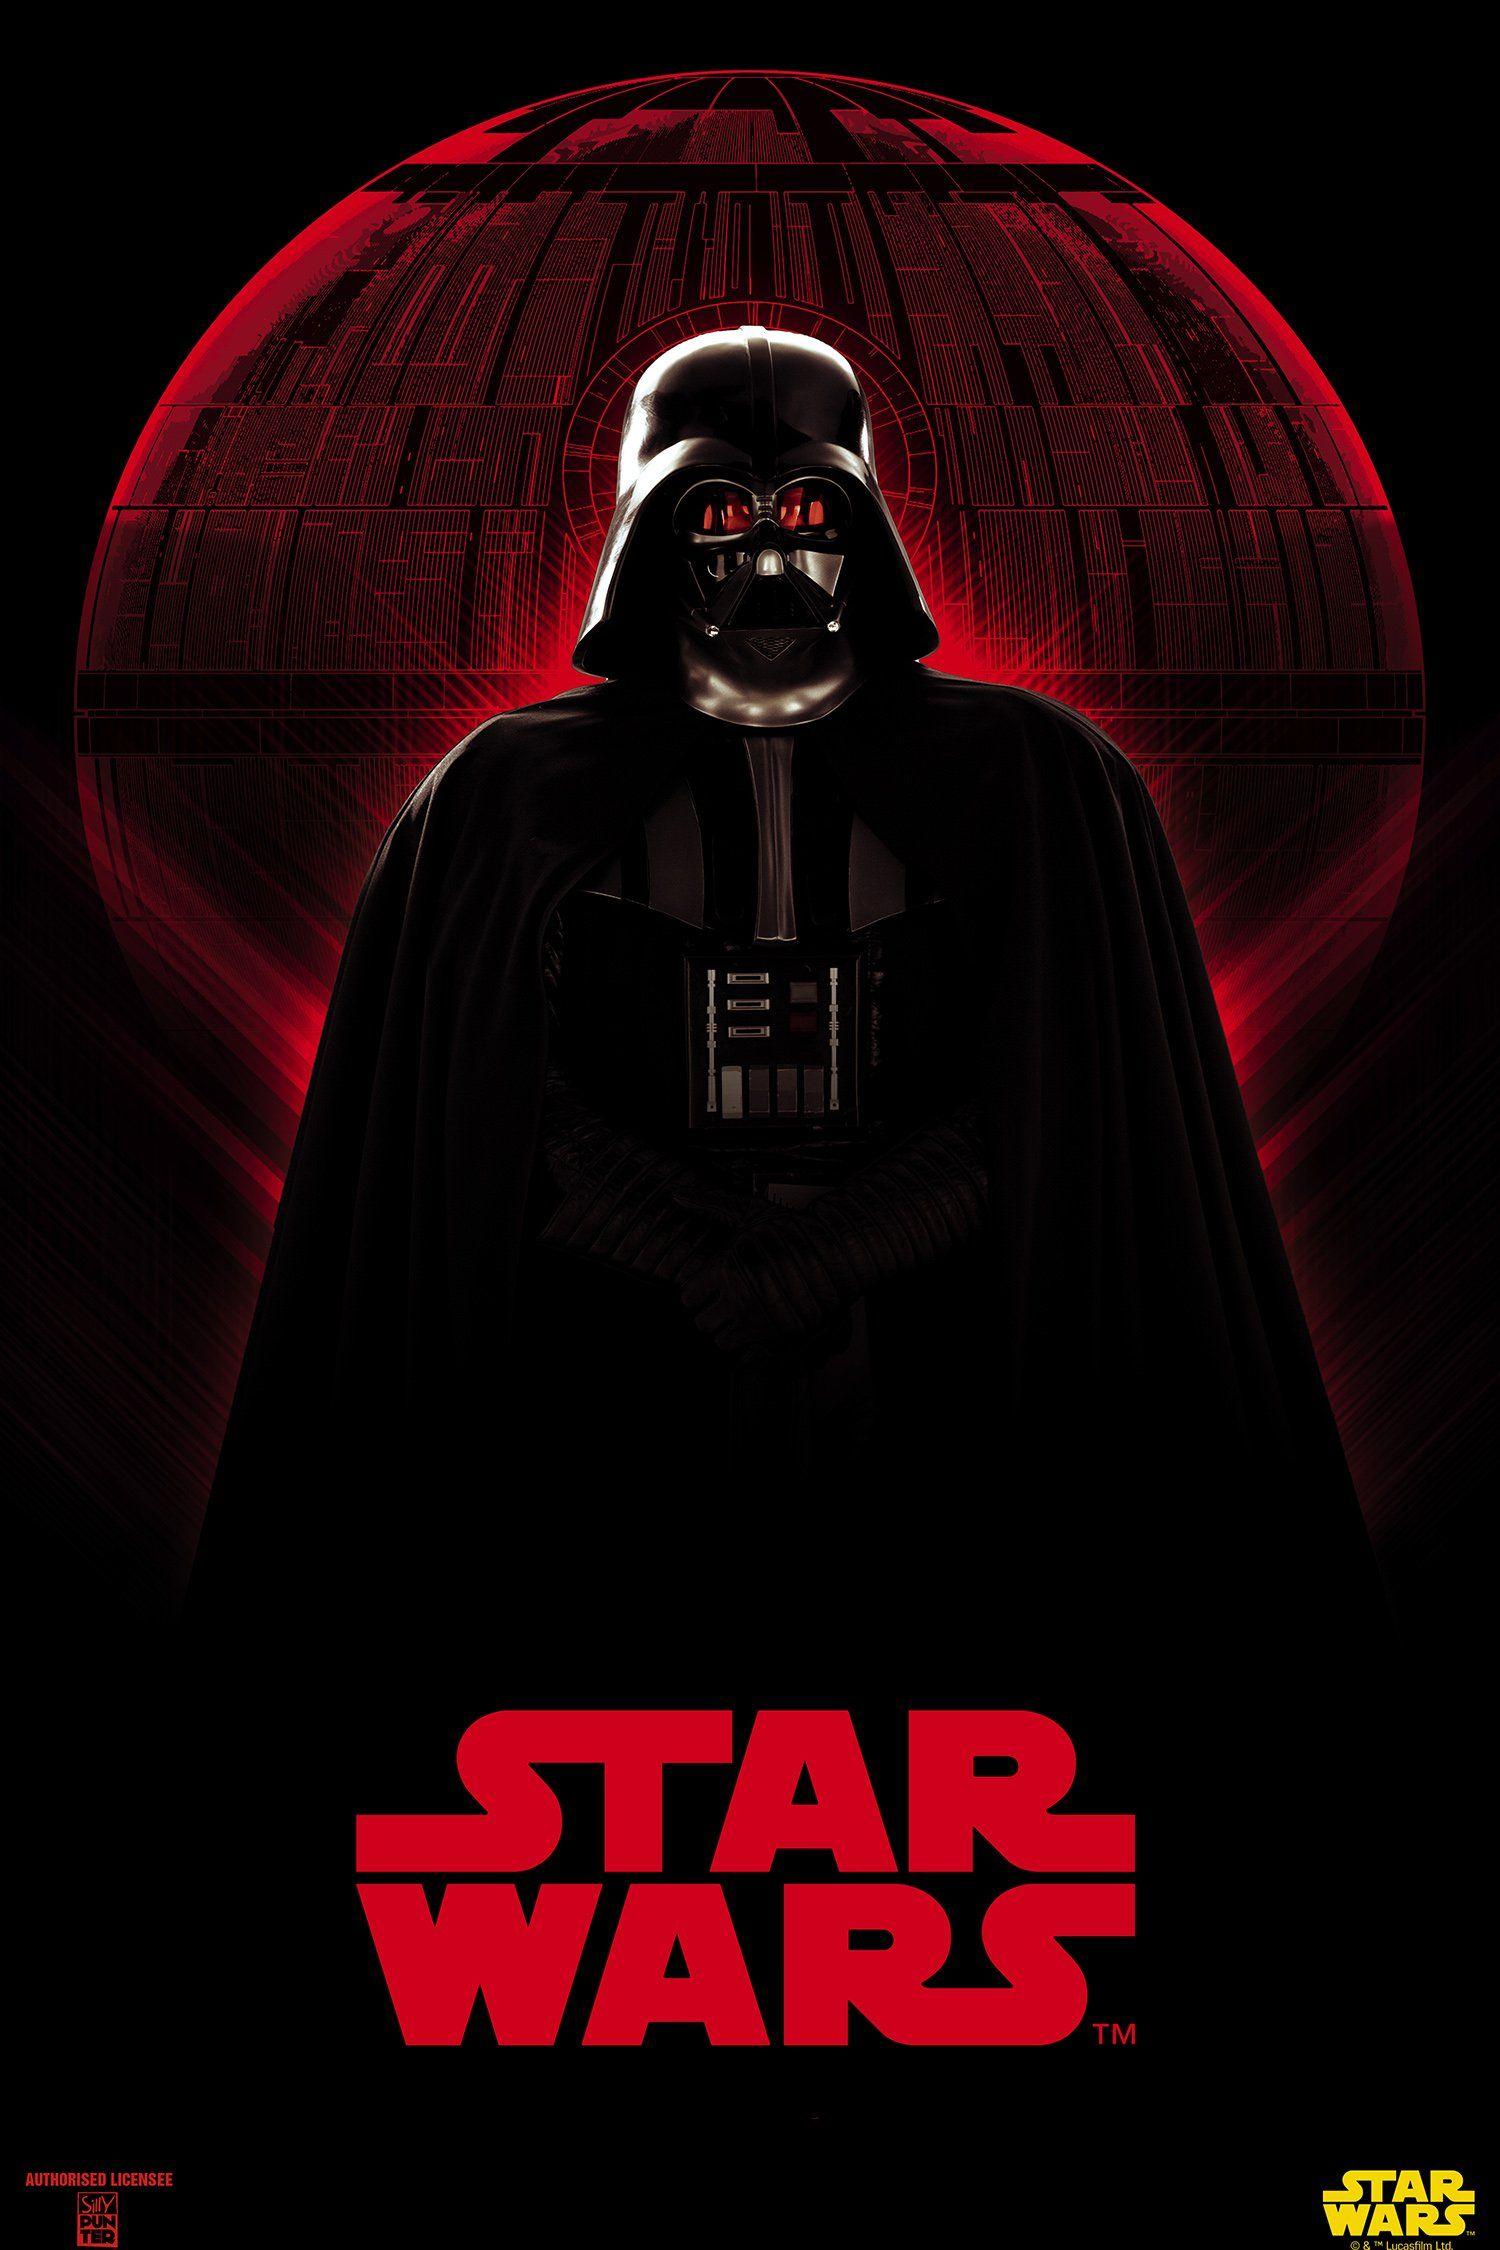 Darth Vader Star Wars Poster Rogue One Star Wars Star Wars